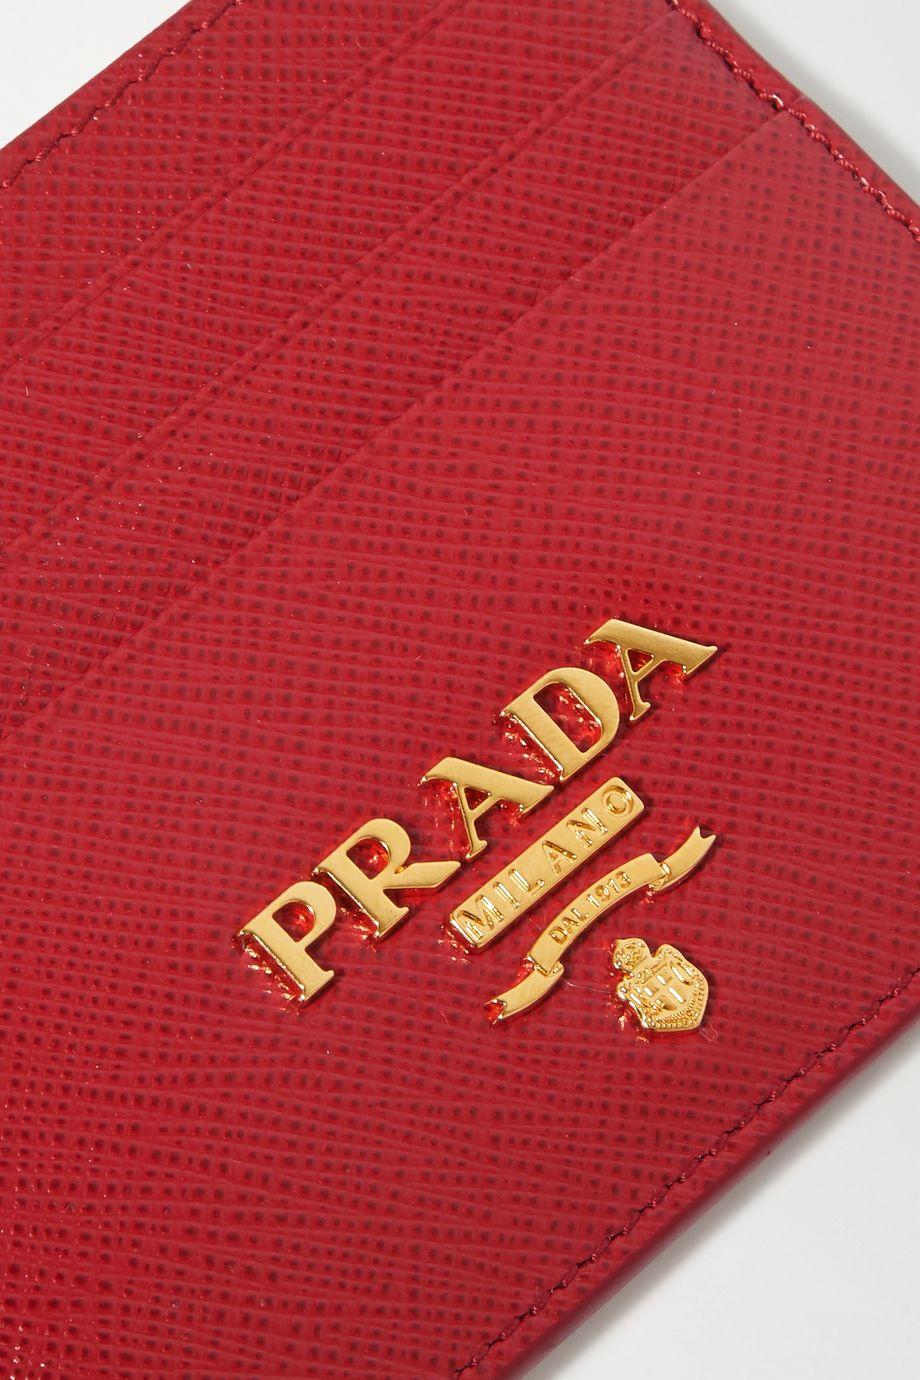 Prada Textured-leather cardholder